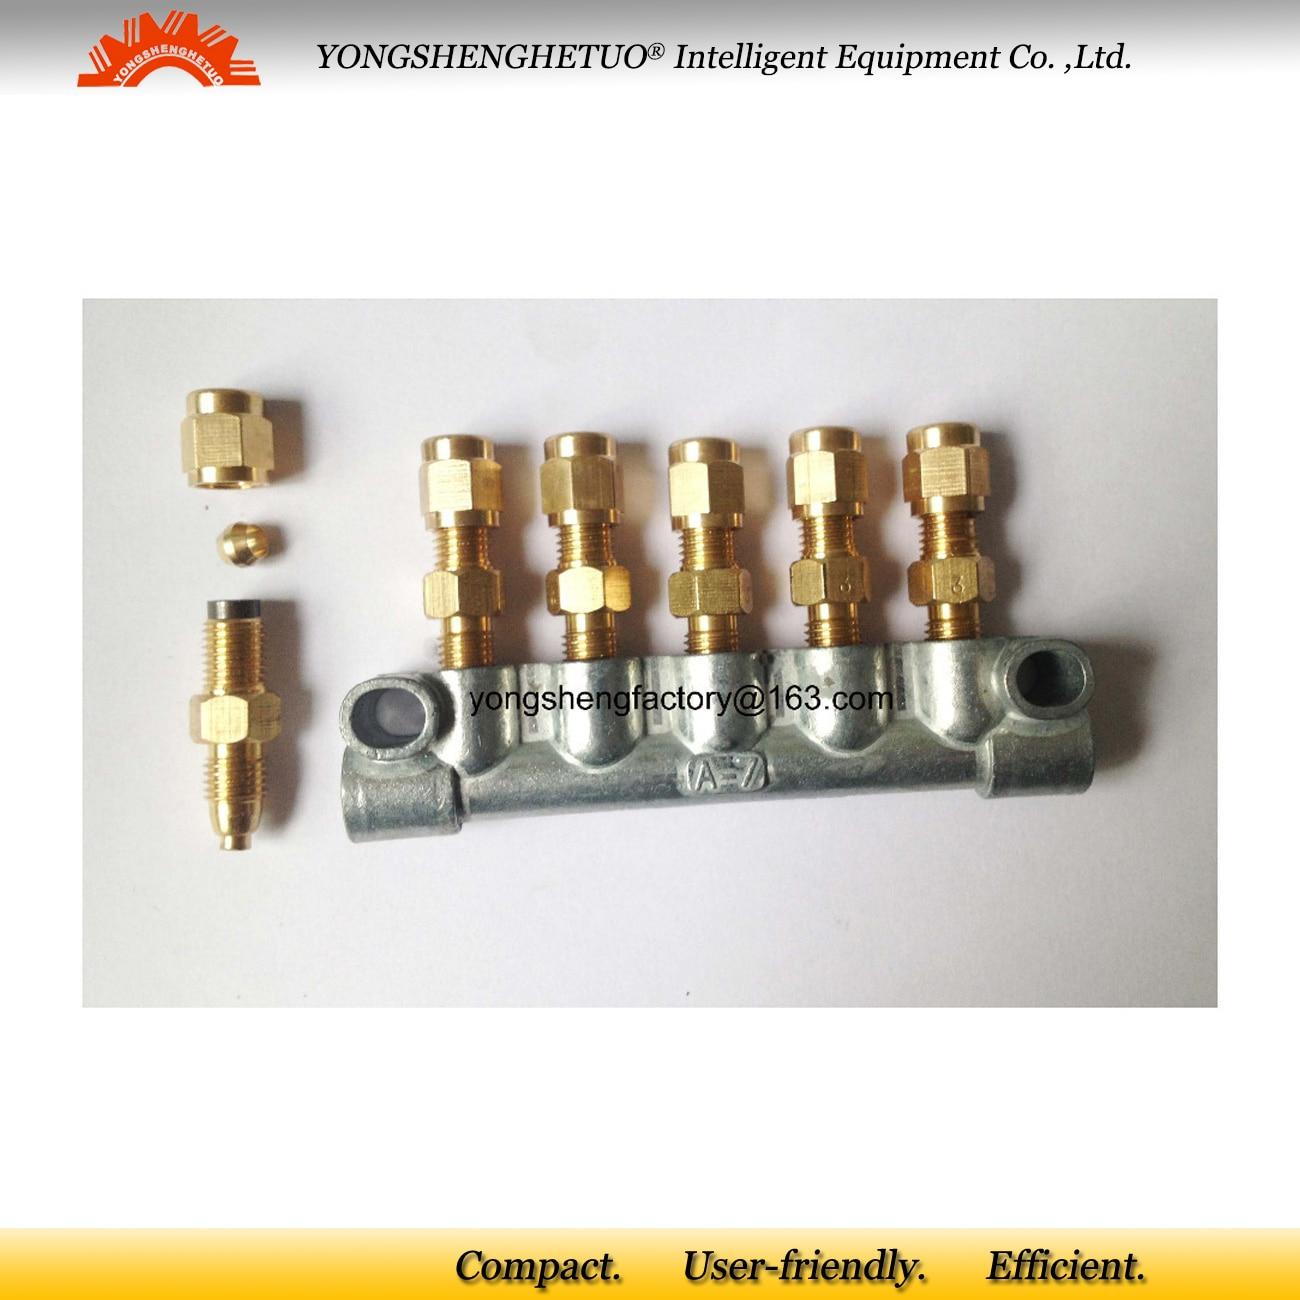 Lubrication resistance oil distributor 5 M8 1 outlet M10 1 inlet junction block oil flow piston